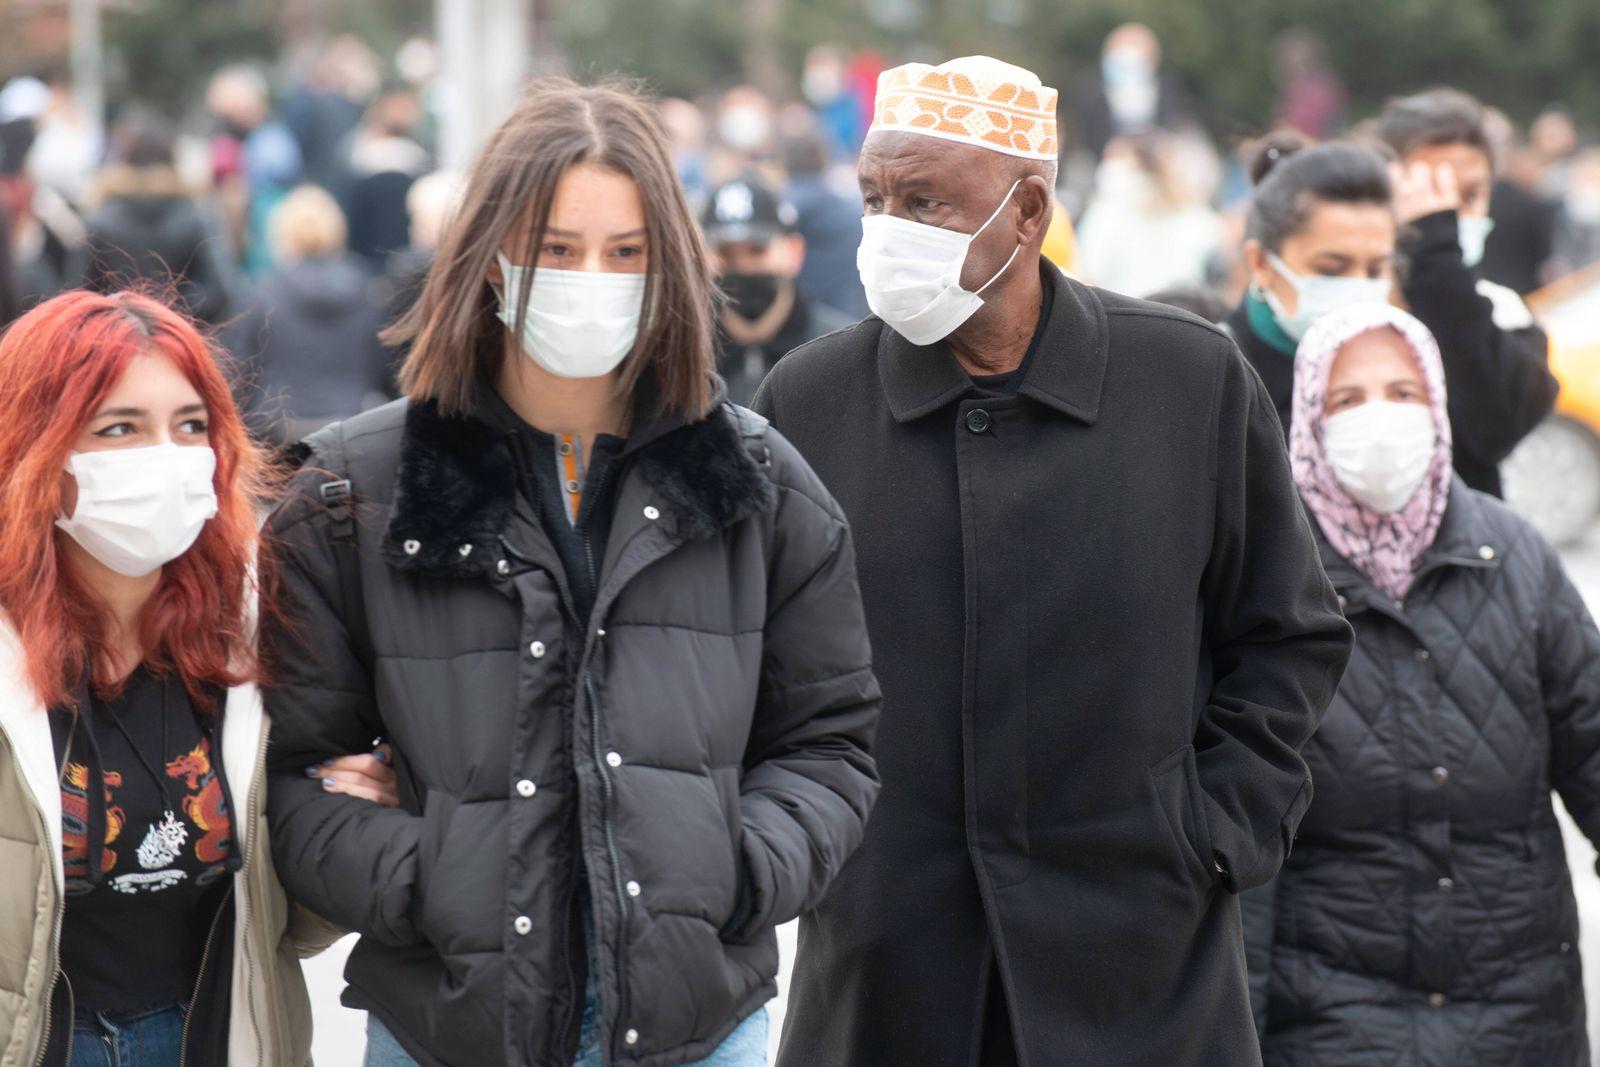 People wearing face masks walk on a street in Ankara, Turkey, on March 31, 2021. Turkey has confirmed 31,537 deaths and